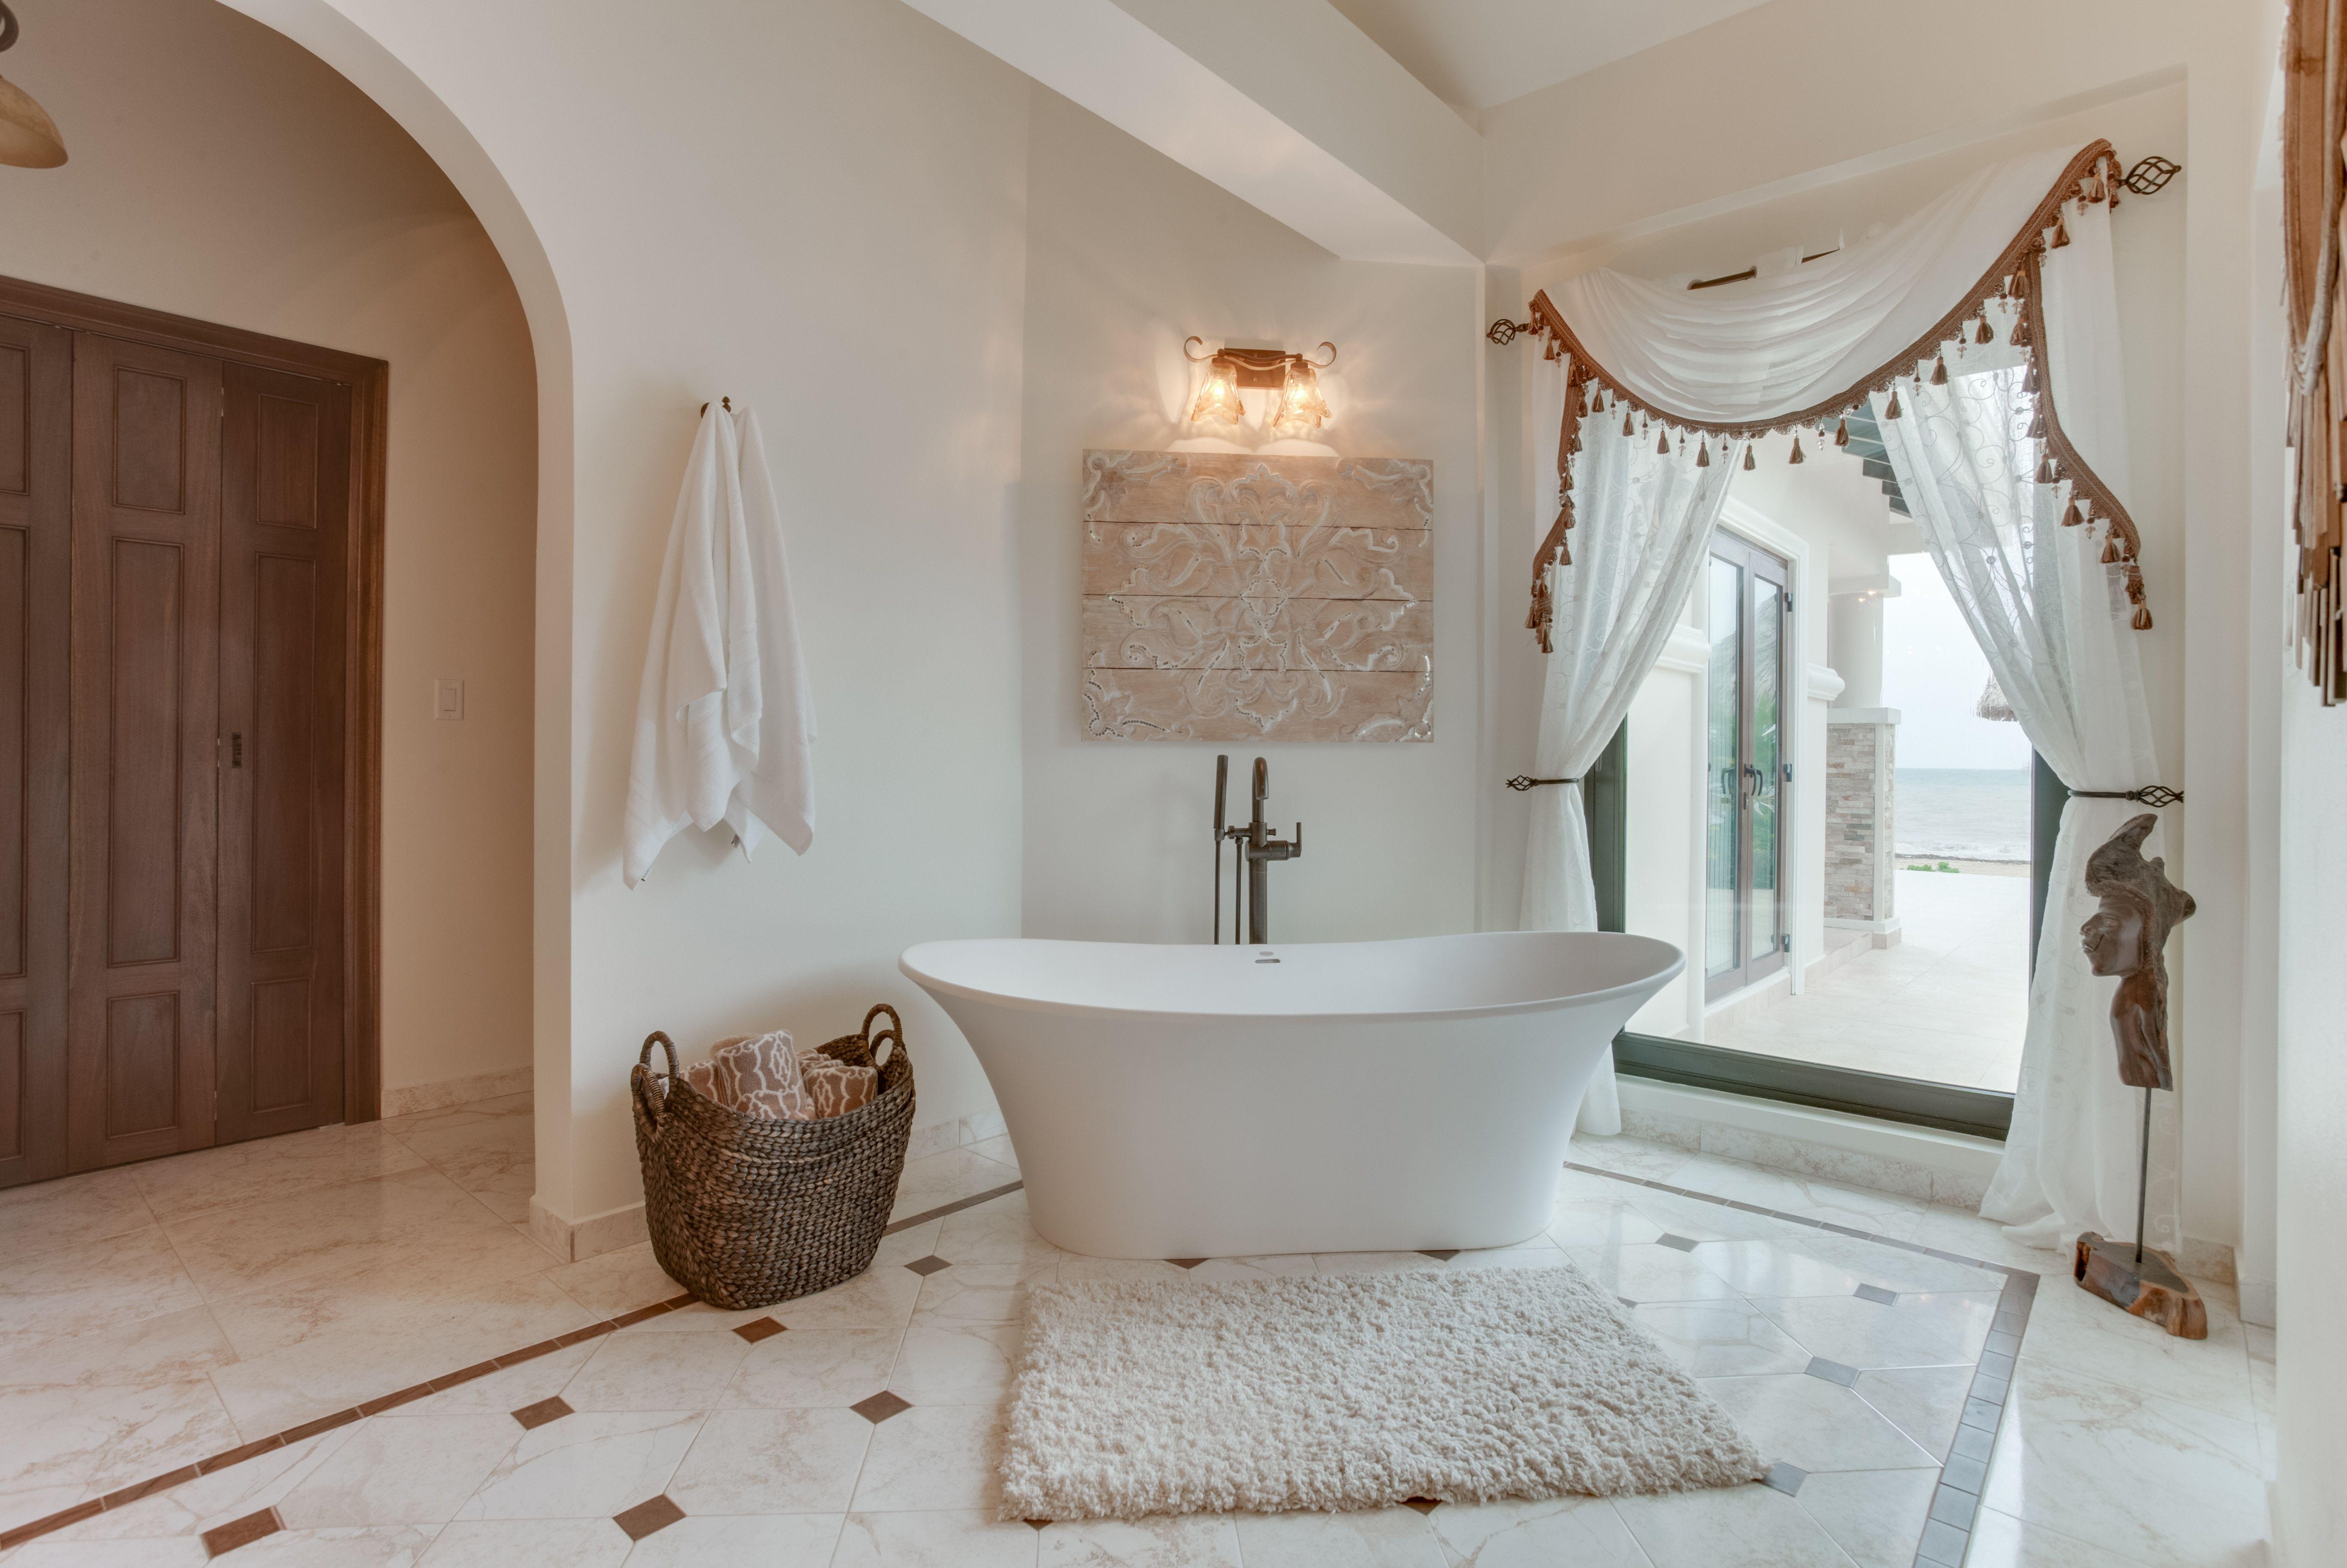 Jacuzzi Verona Unique Size Soaking Tub Available